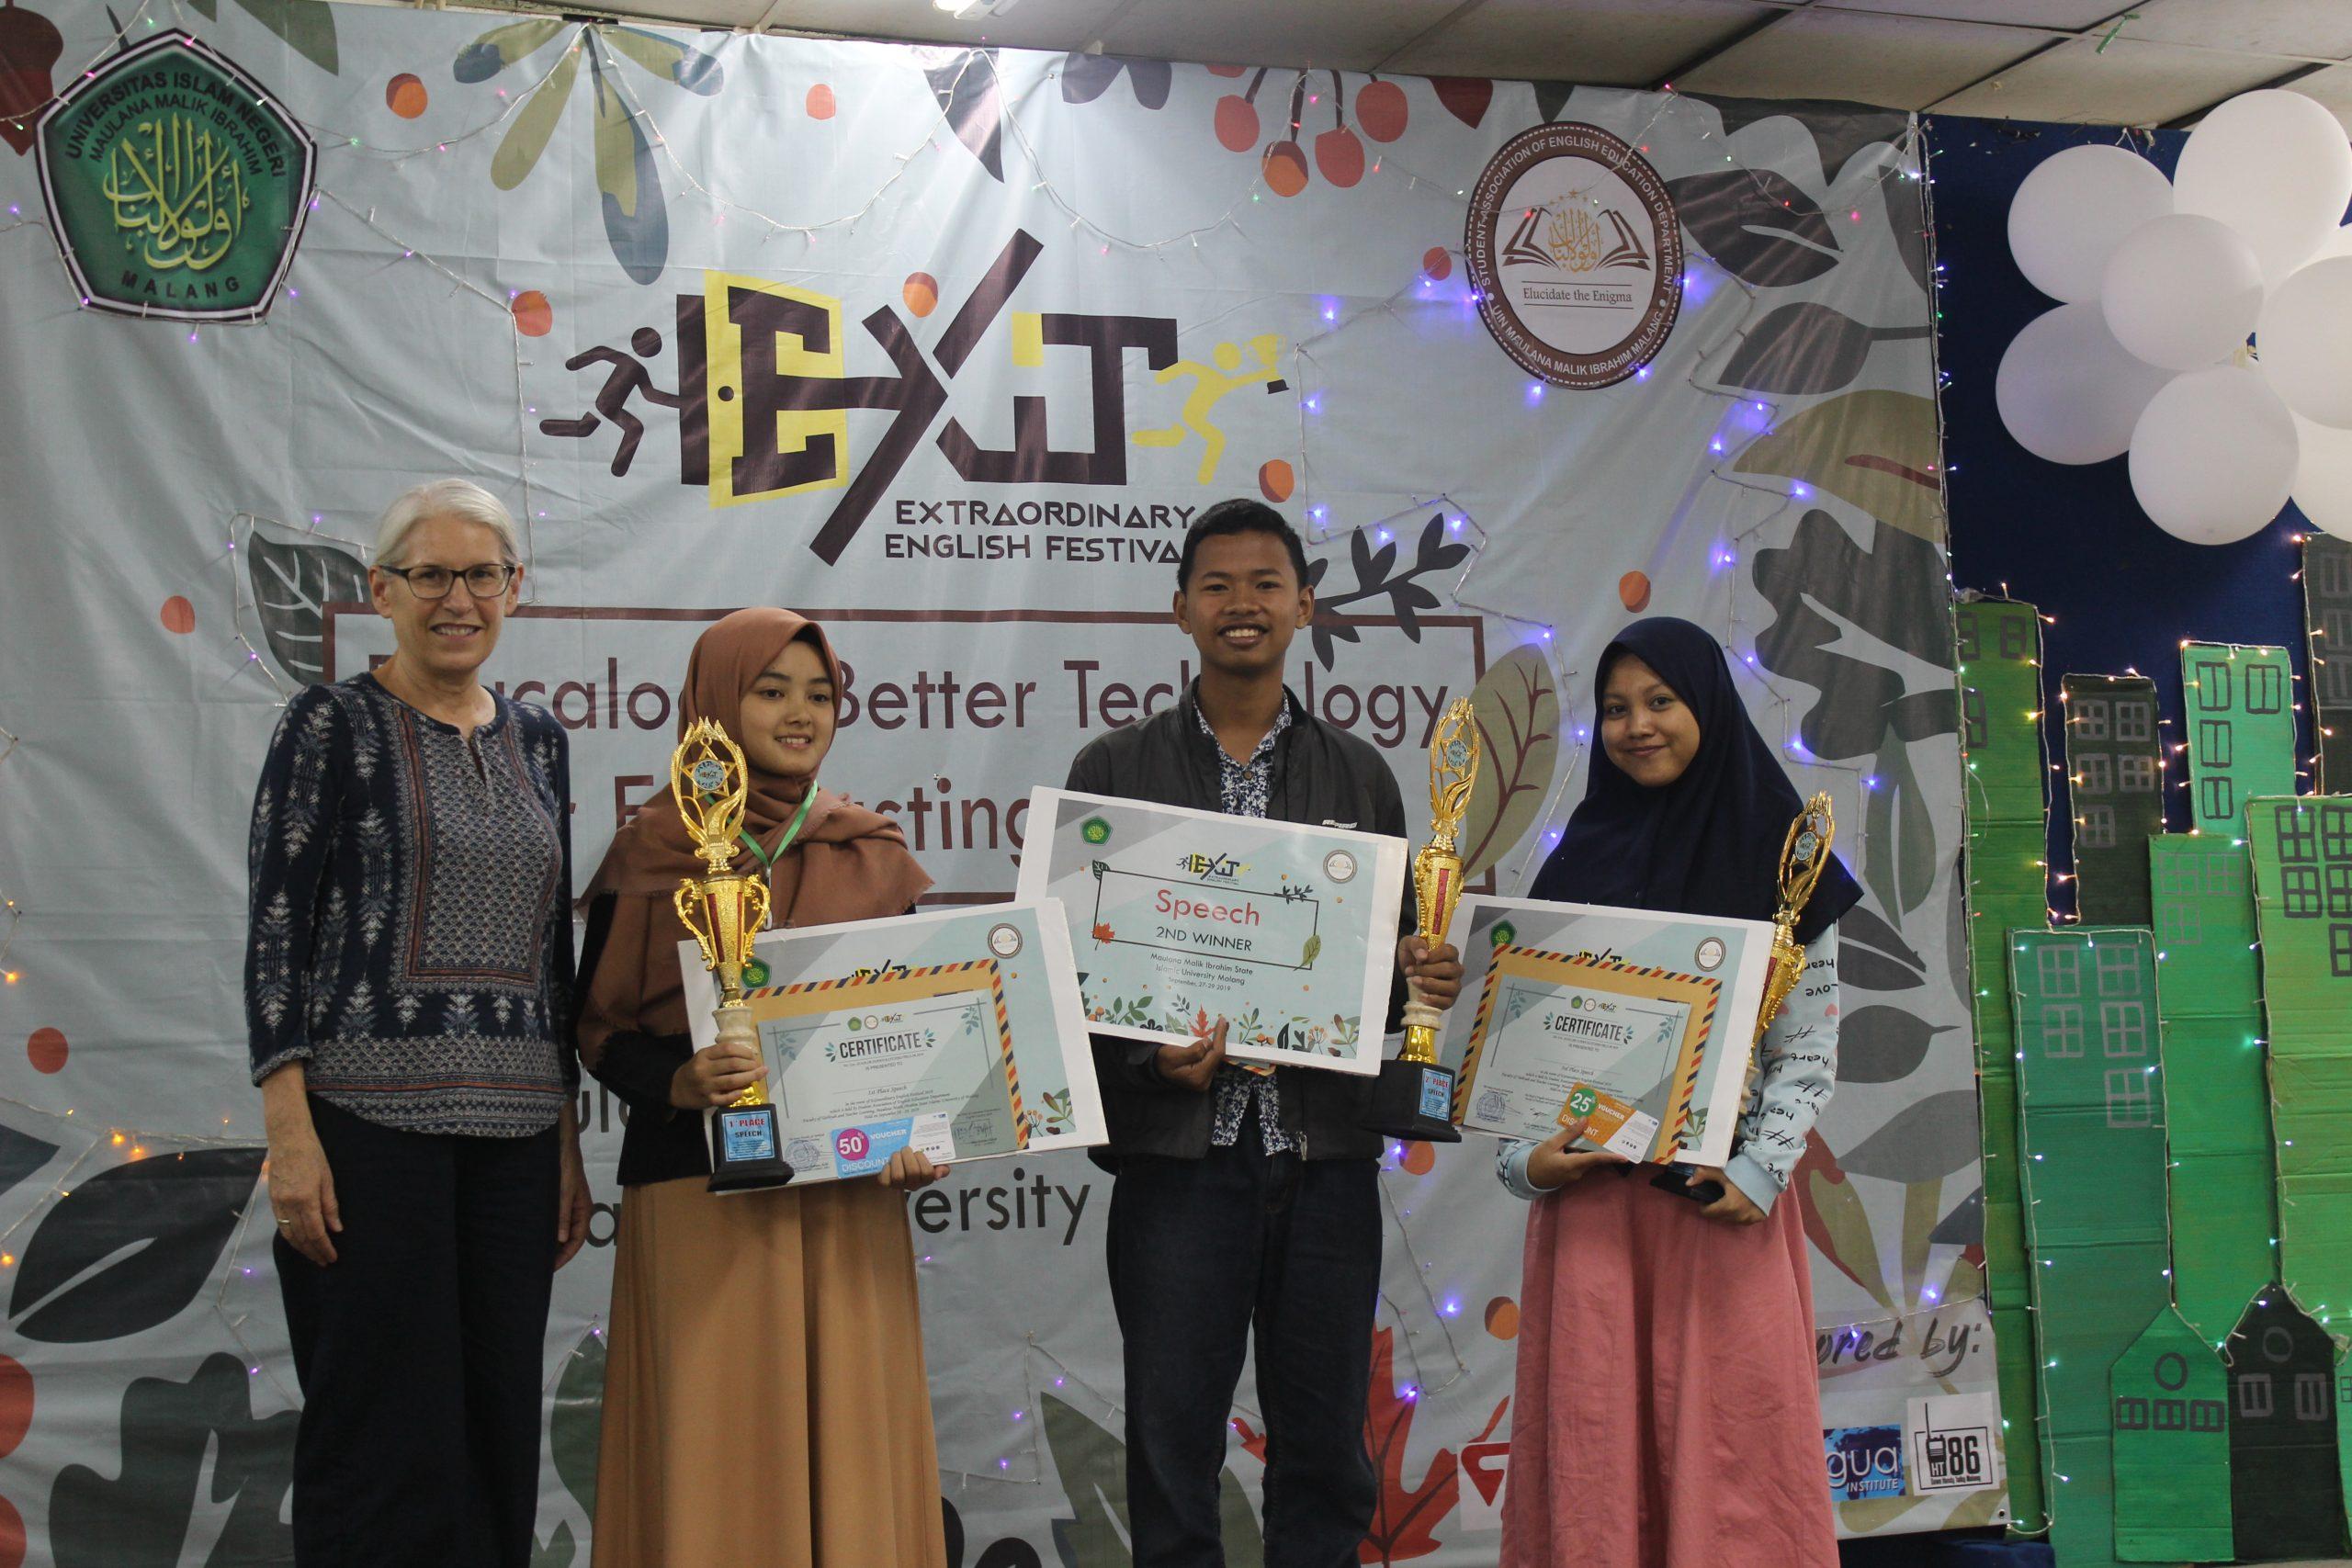 EXIT (Extraordinary English Festival) 2019